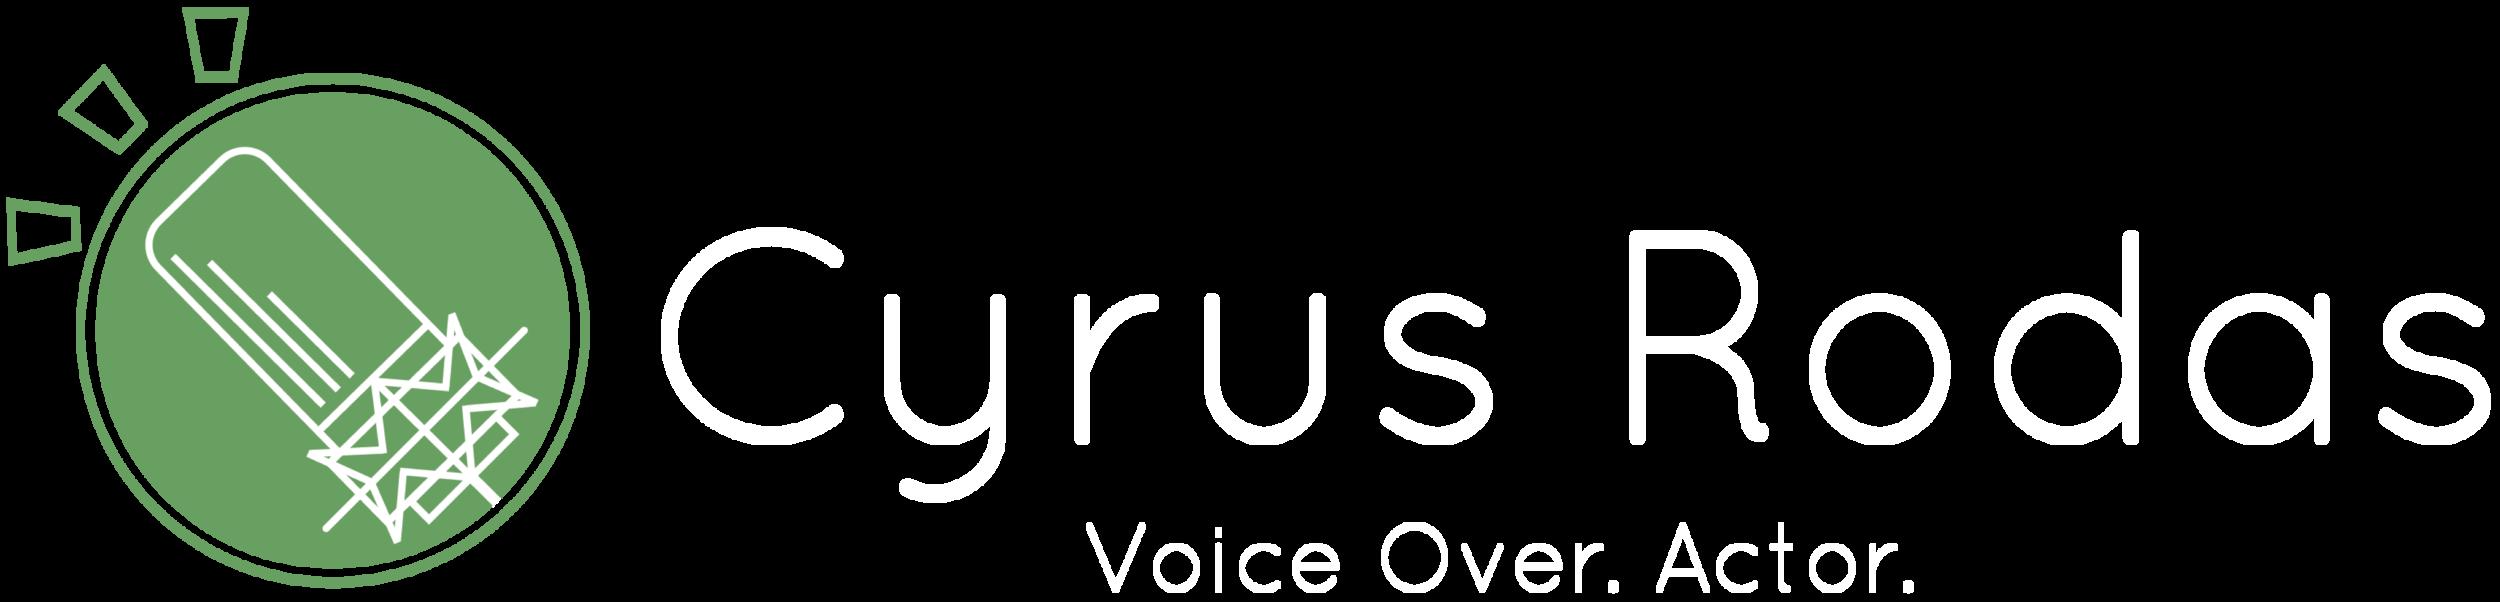 CyrusRodasLogo